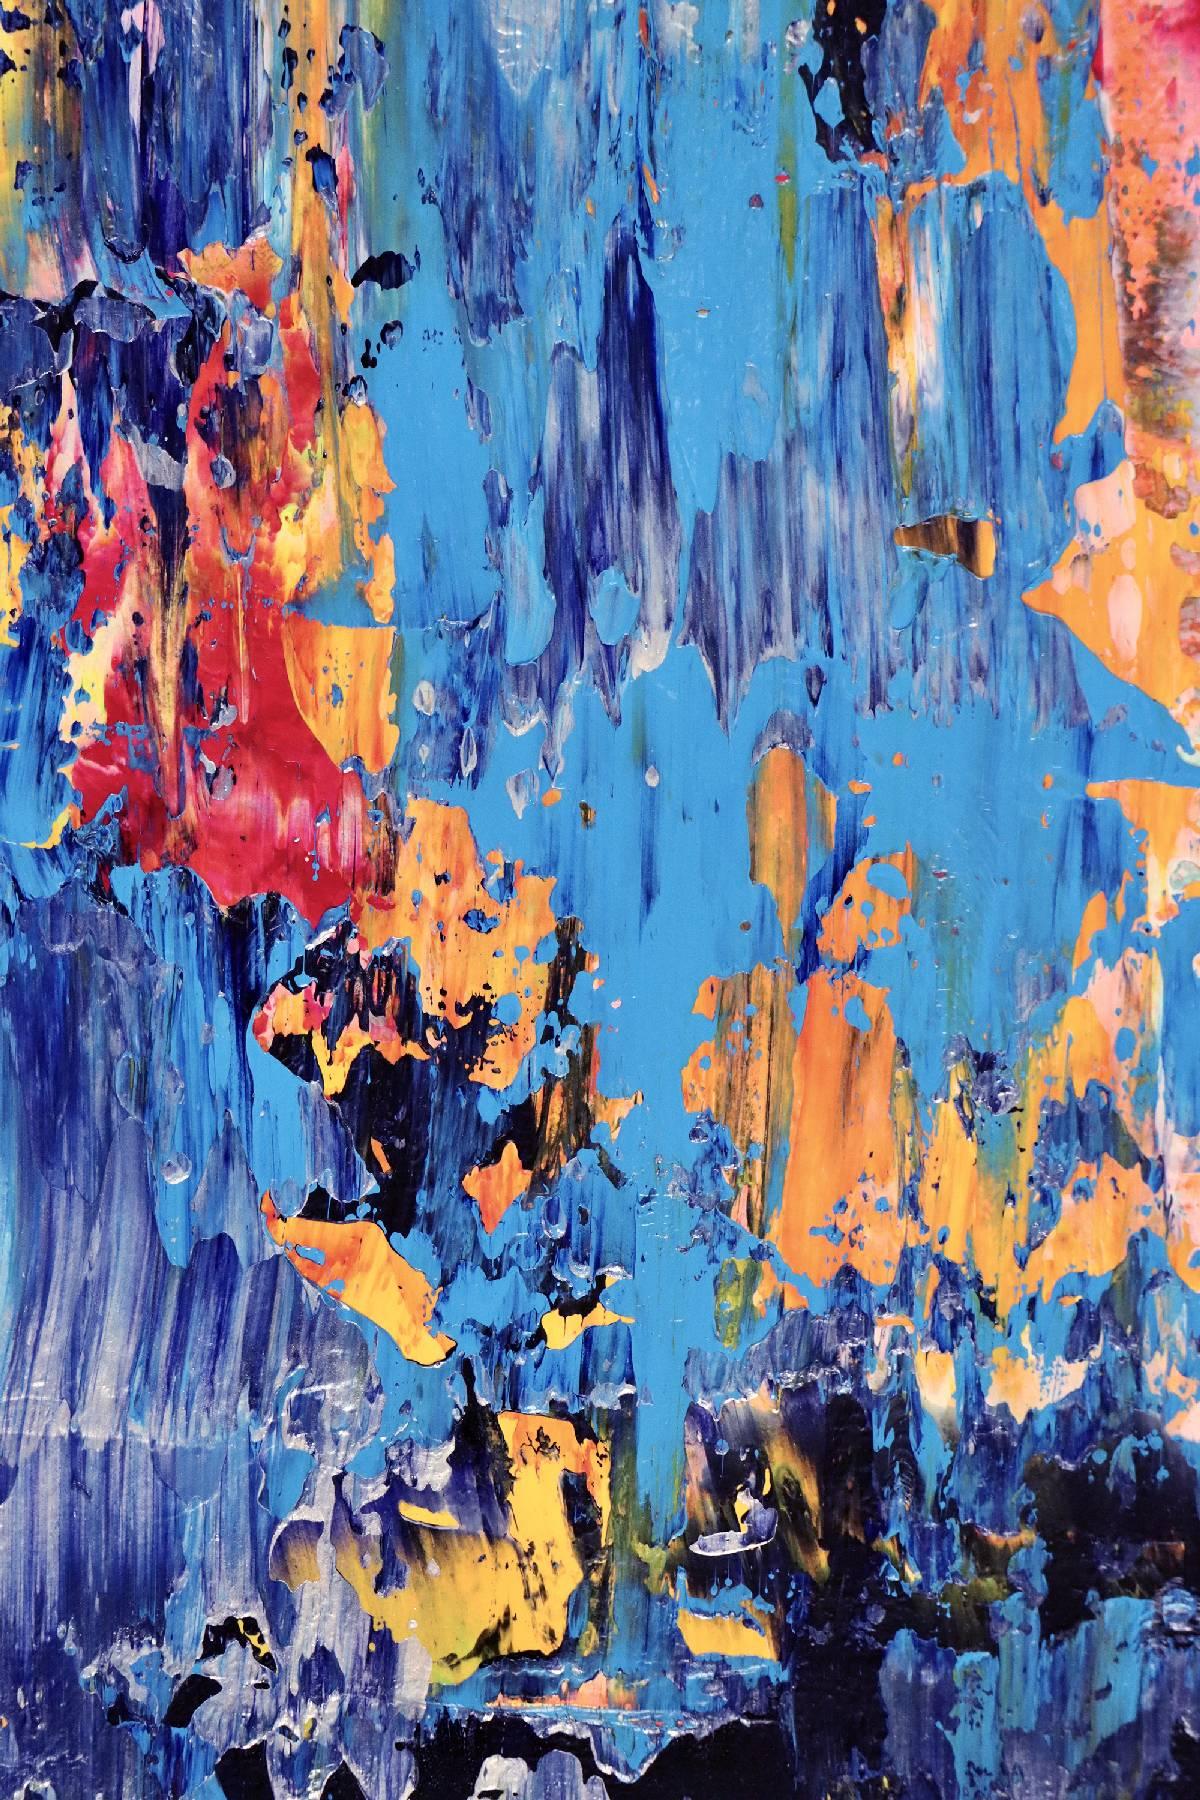 Detail - Rapid Iridescent Cascades (2020) by Nestor Toro